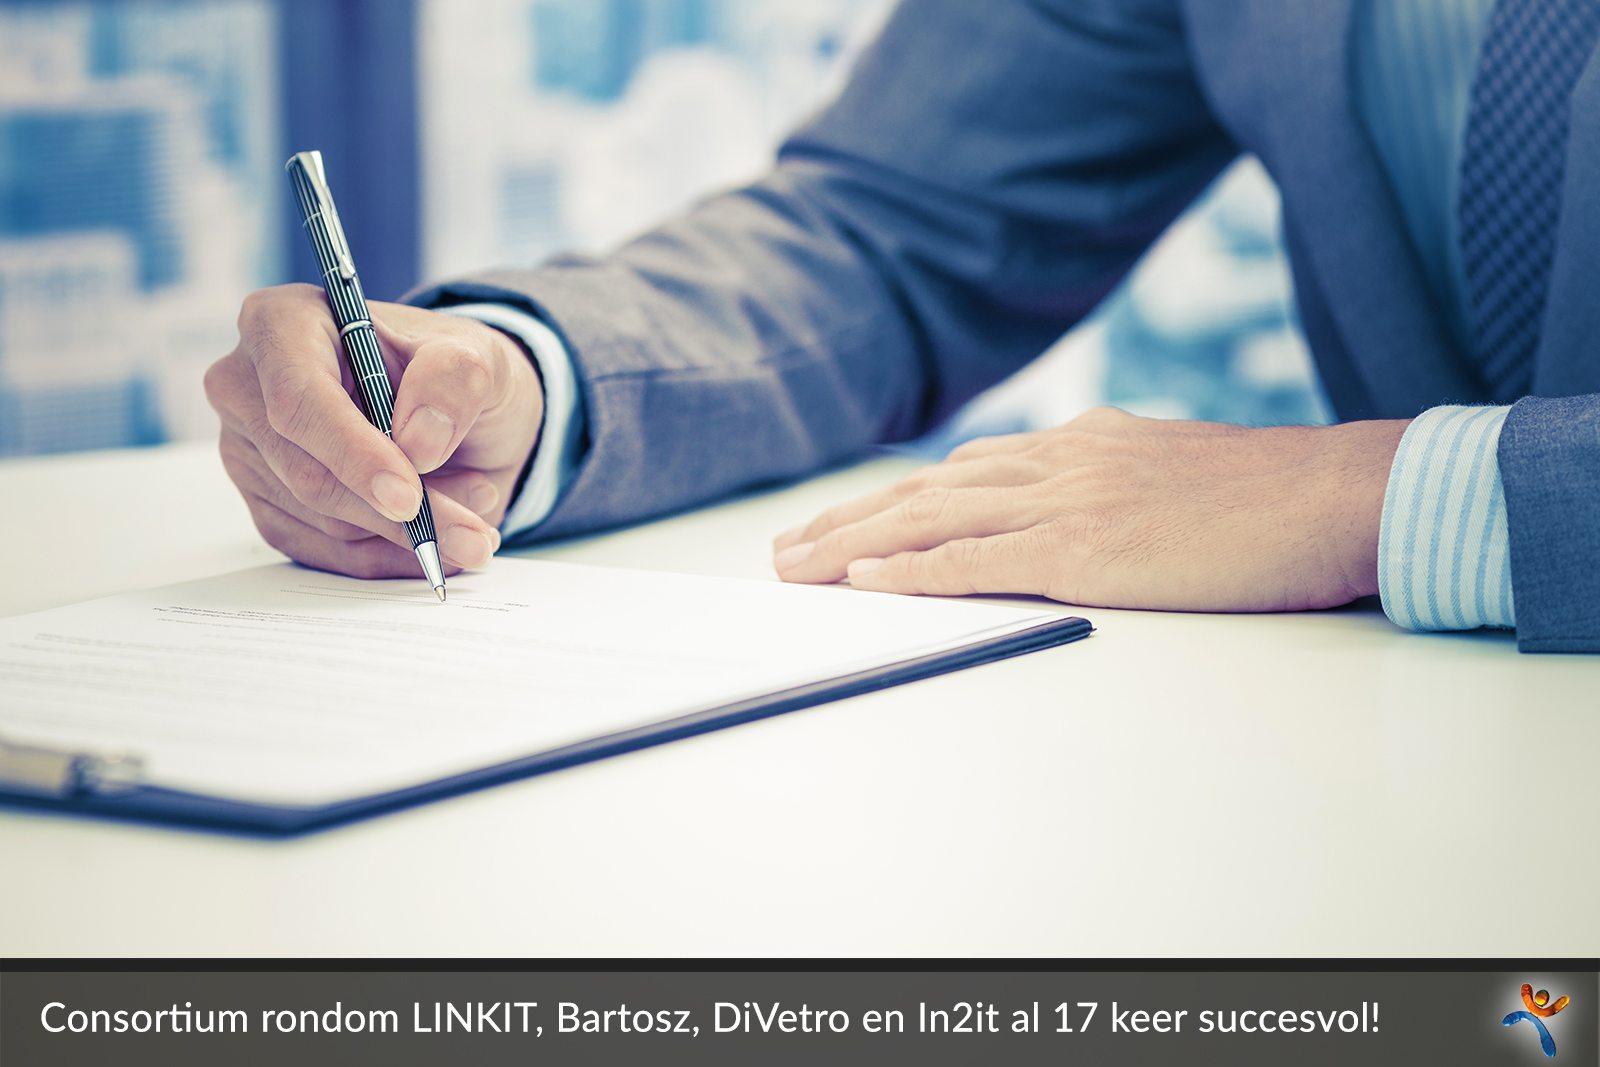 Specialistisch consortium rondom LINKIT, Bartosz, DiVetro en In2it al 17 keer succesvol - DiVetro